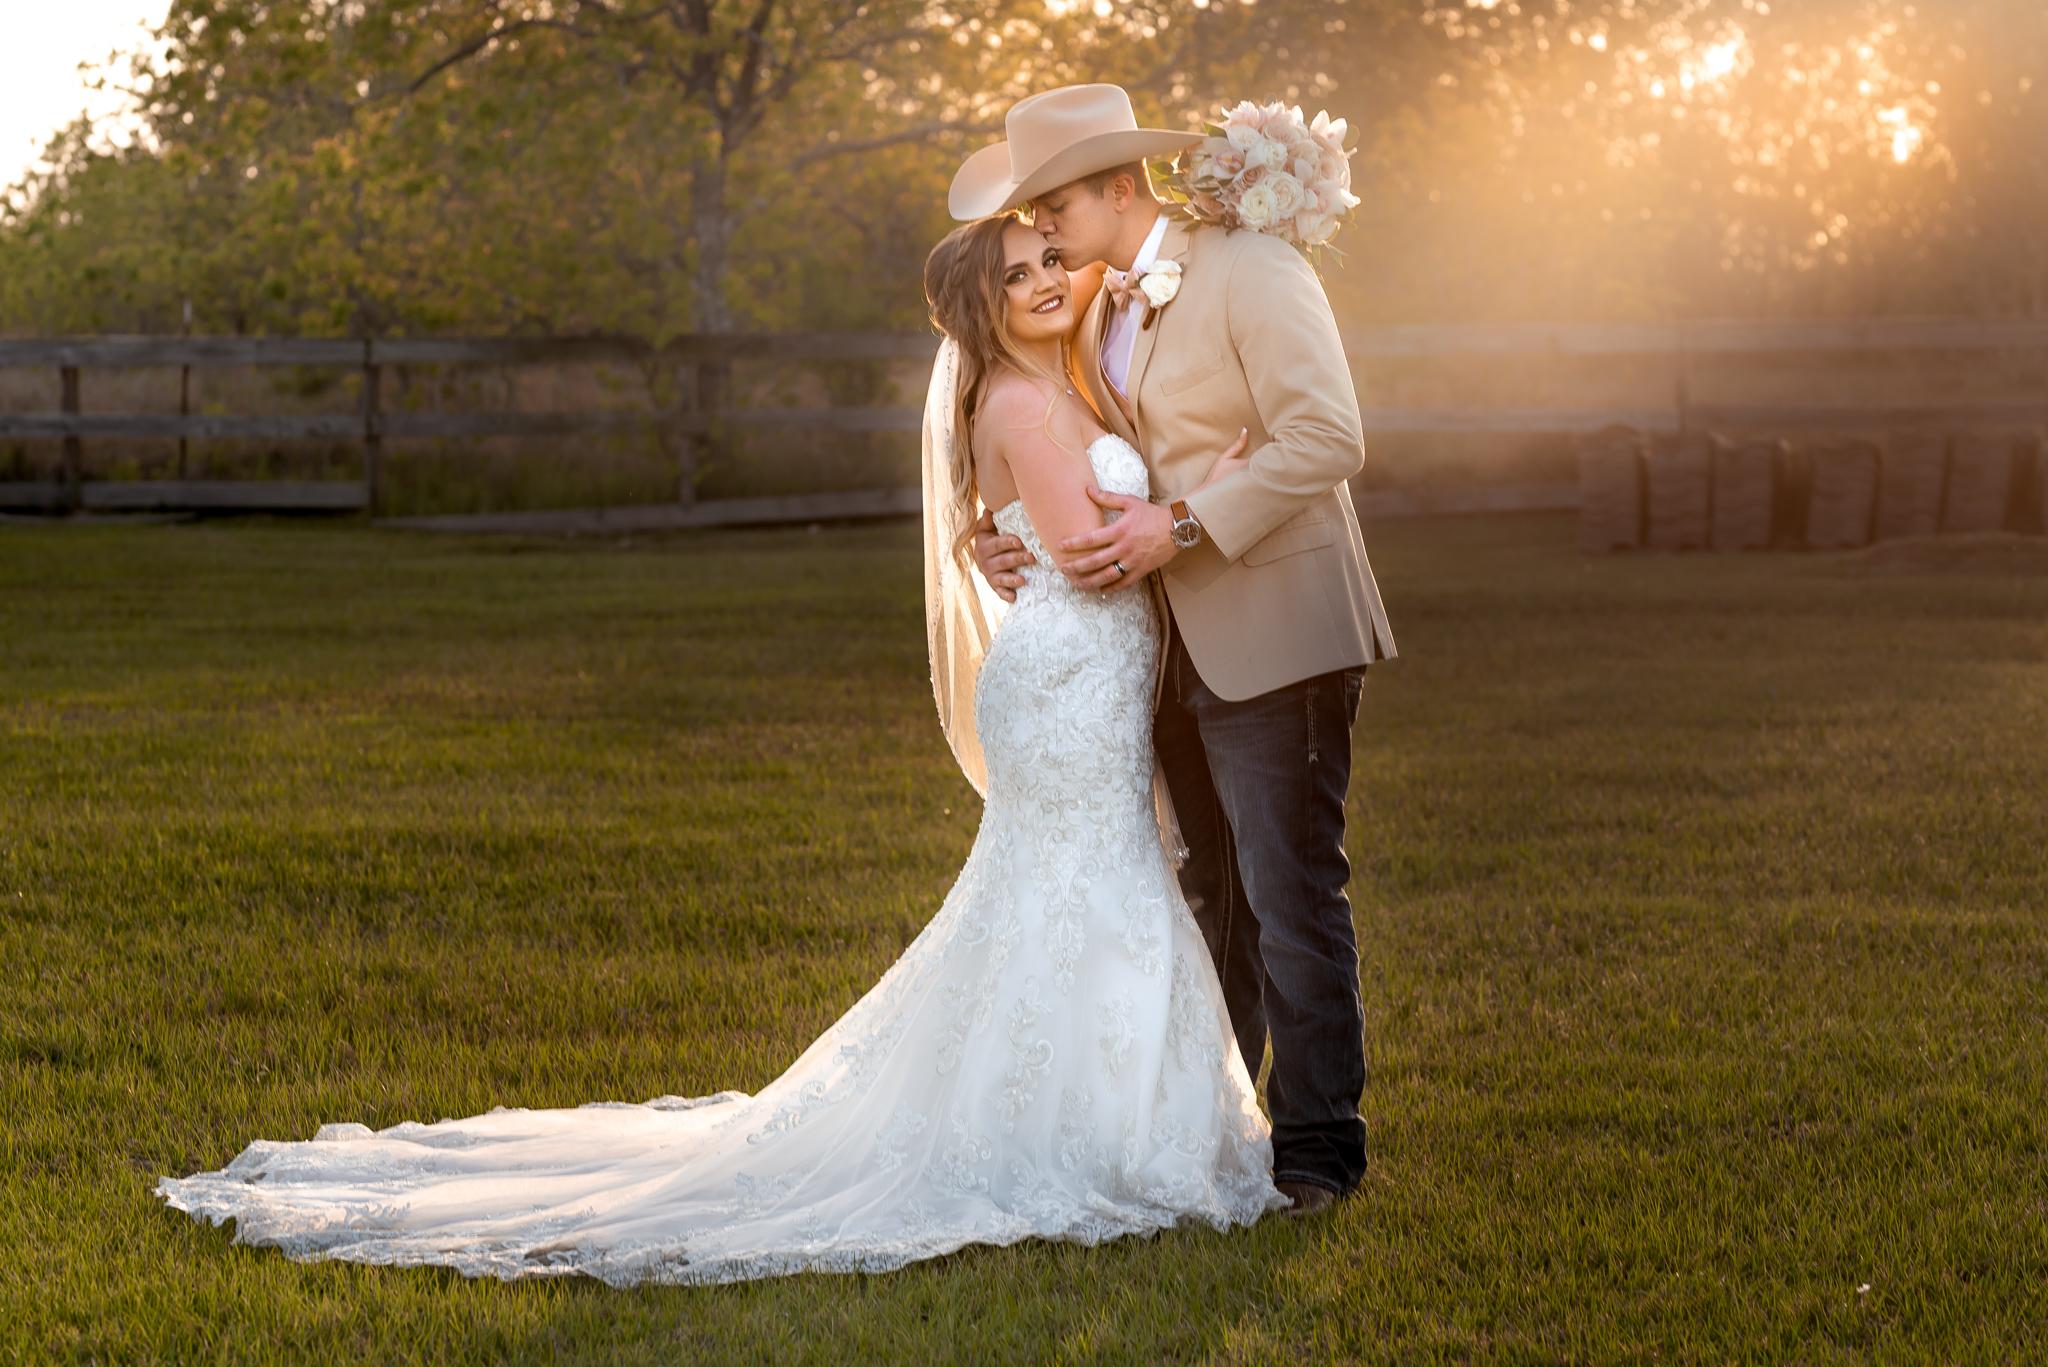 katy-wedding-photographer-houston-wedding-photographer-bride-sugar-land-cypress-richmond-spring-30.jpg